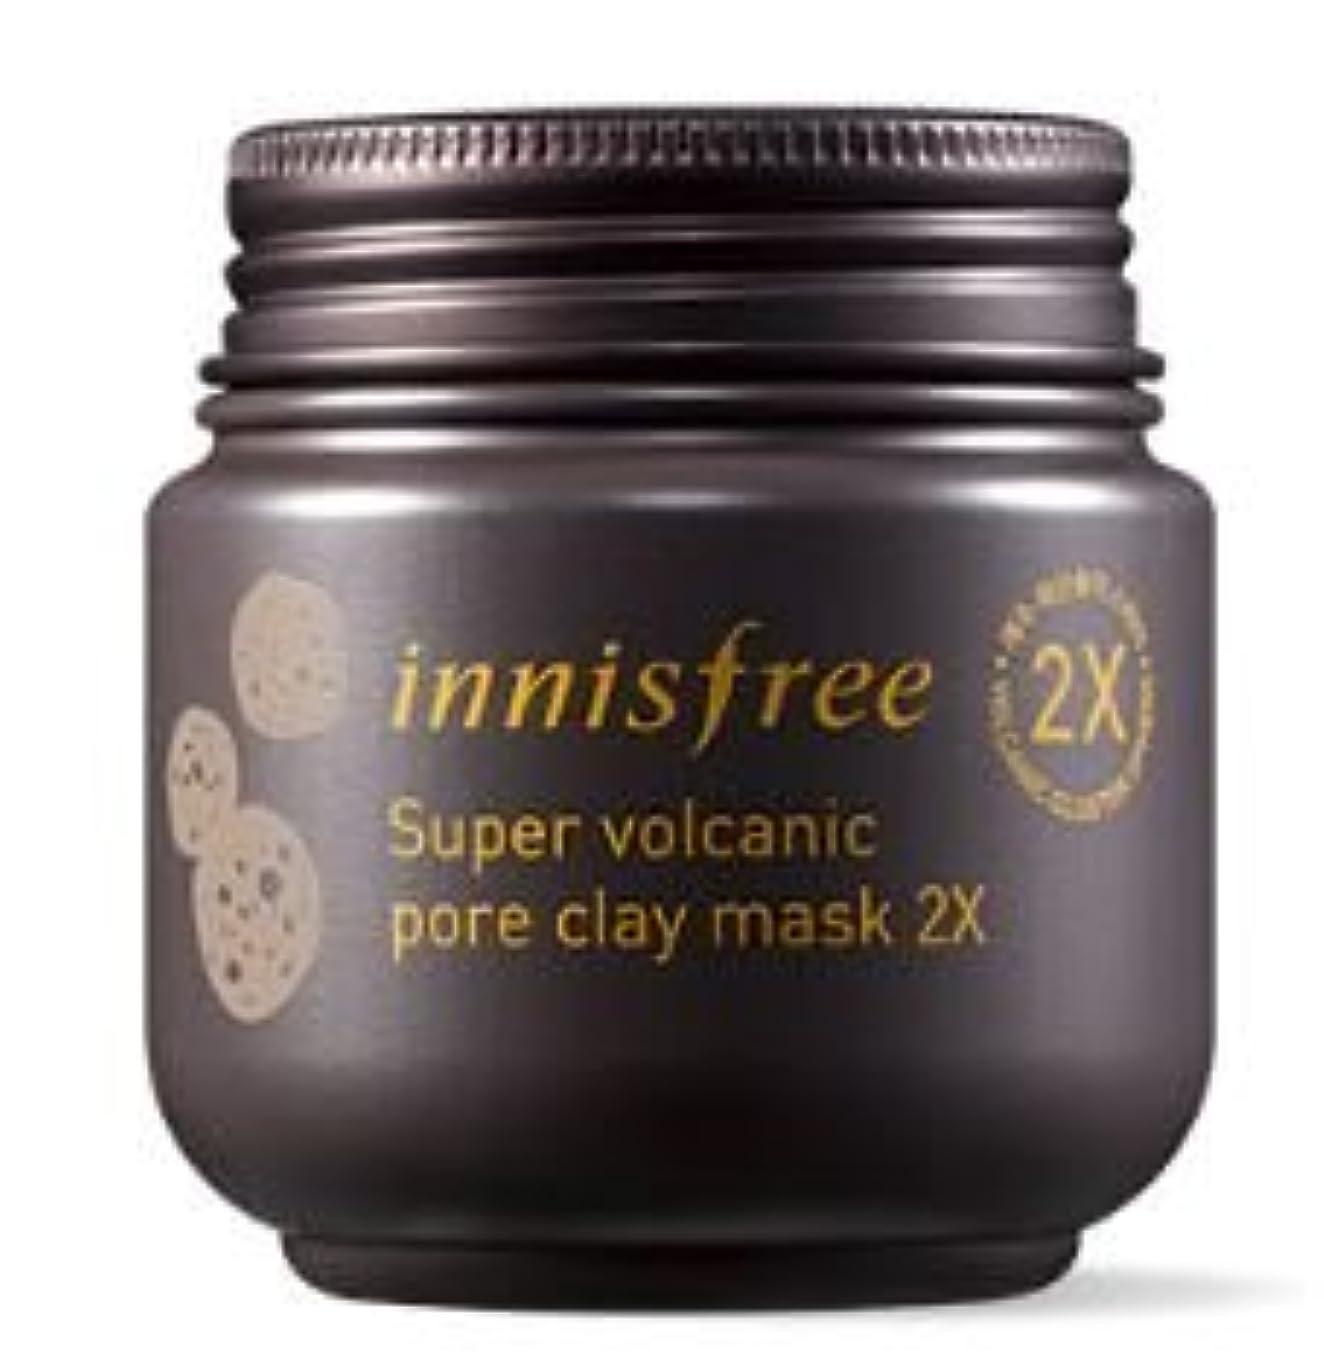 合意暗殺者シャー★NEW★[innisfree] Super Volcanic Pore Clay Mask 2x 100ml [並行輸入品]